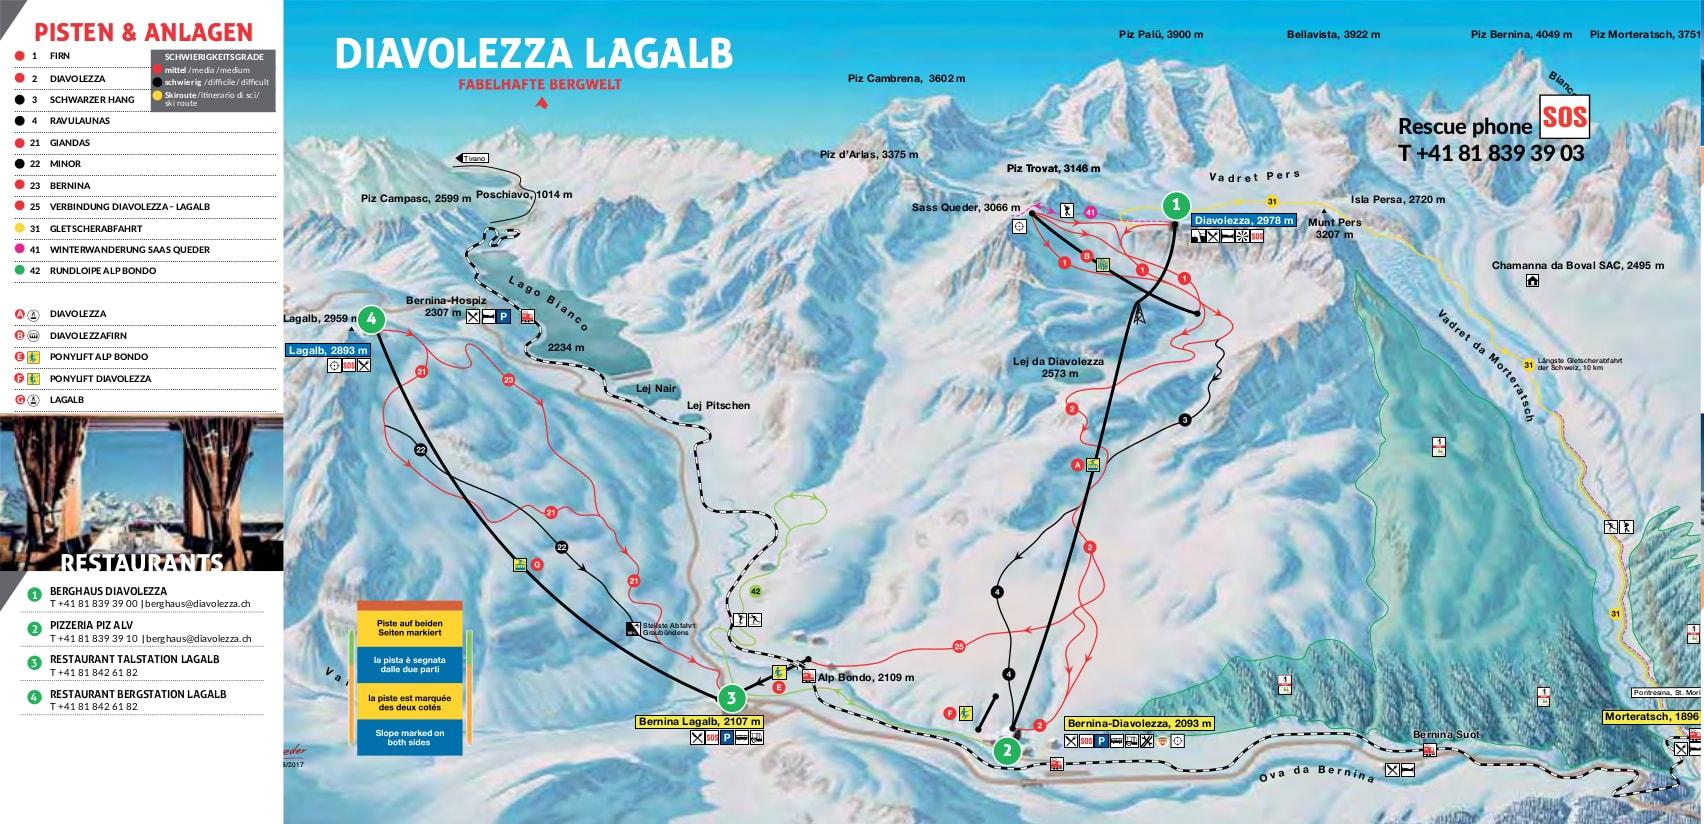 Diavolezza-Lagalb Piste / Trail Map